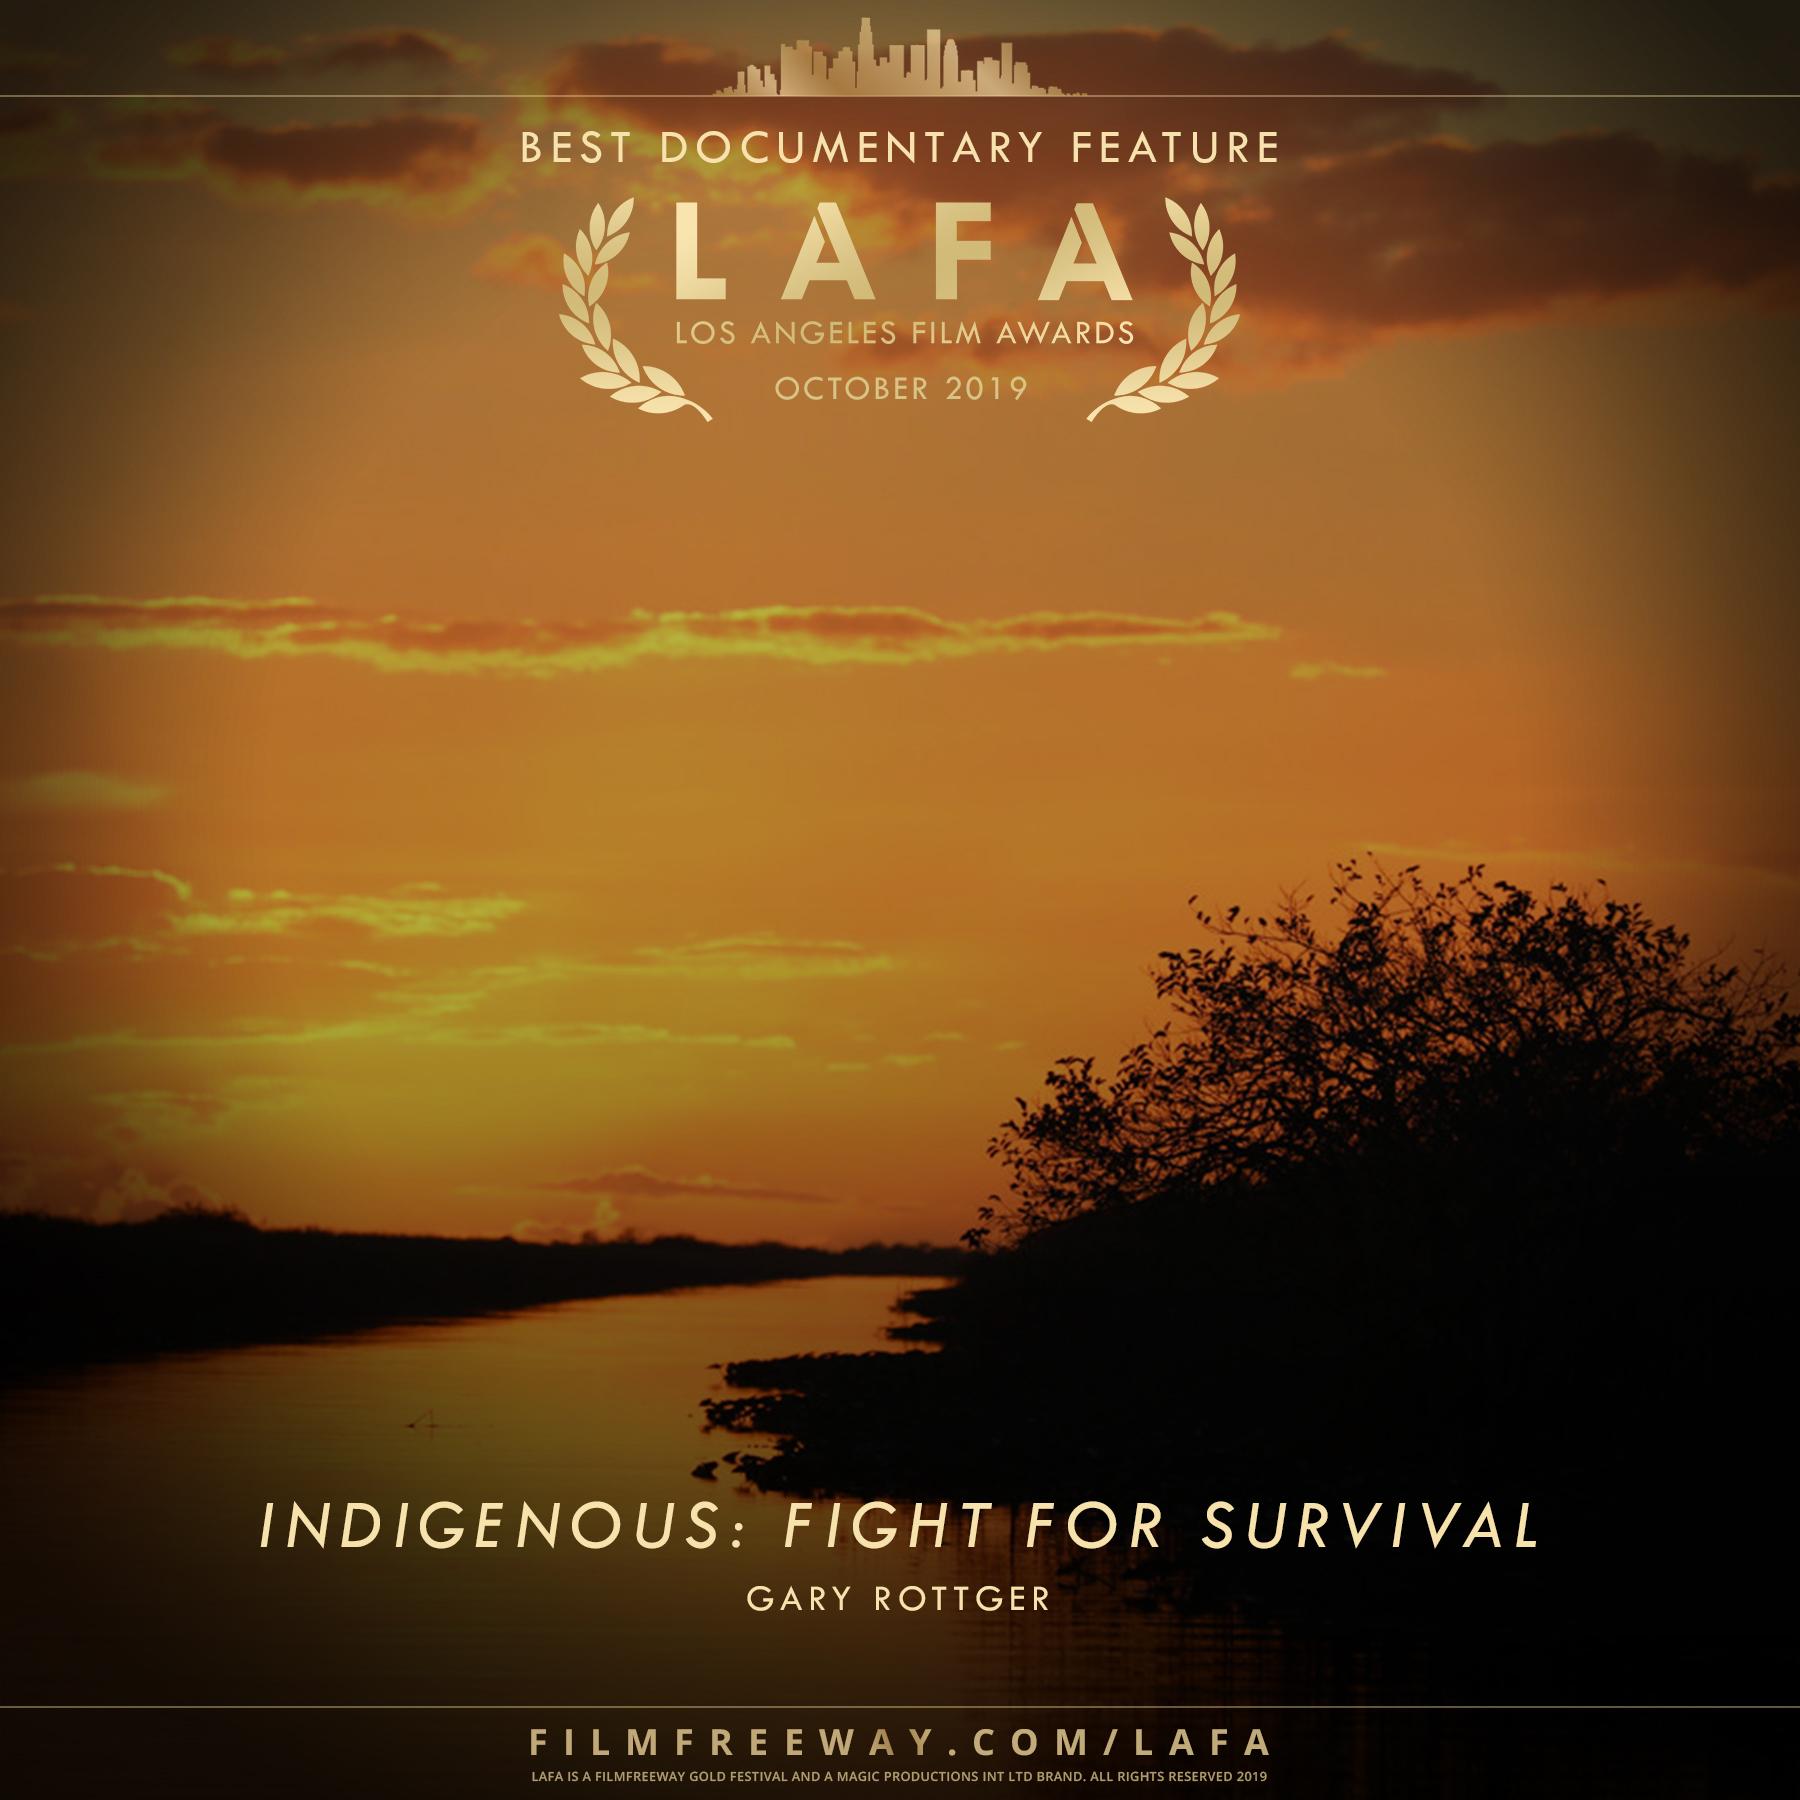 Indigenous Fight for Survival design